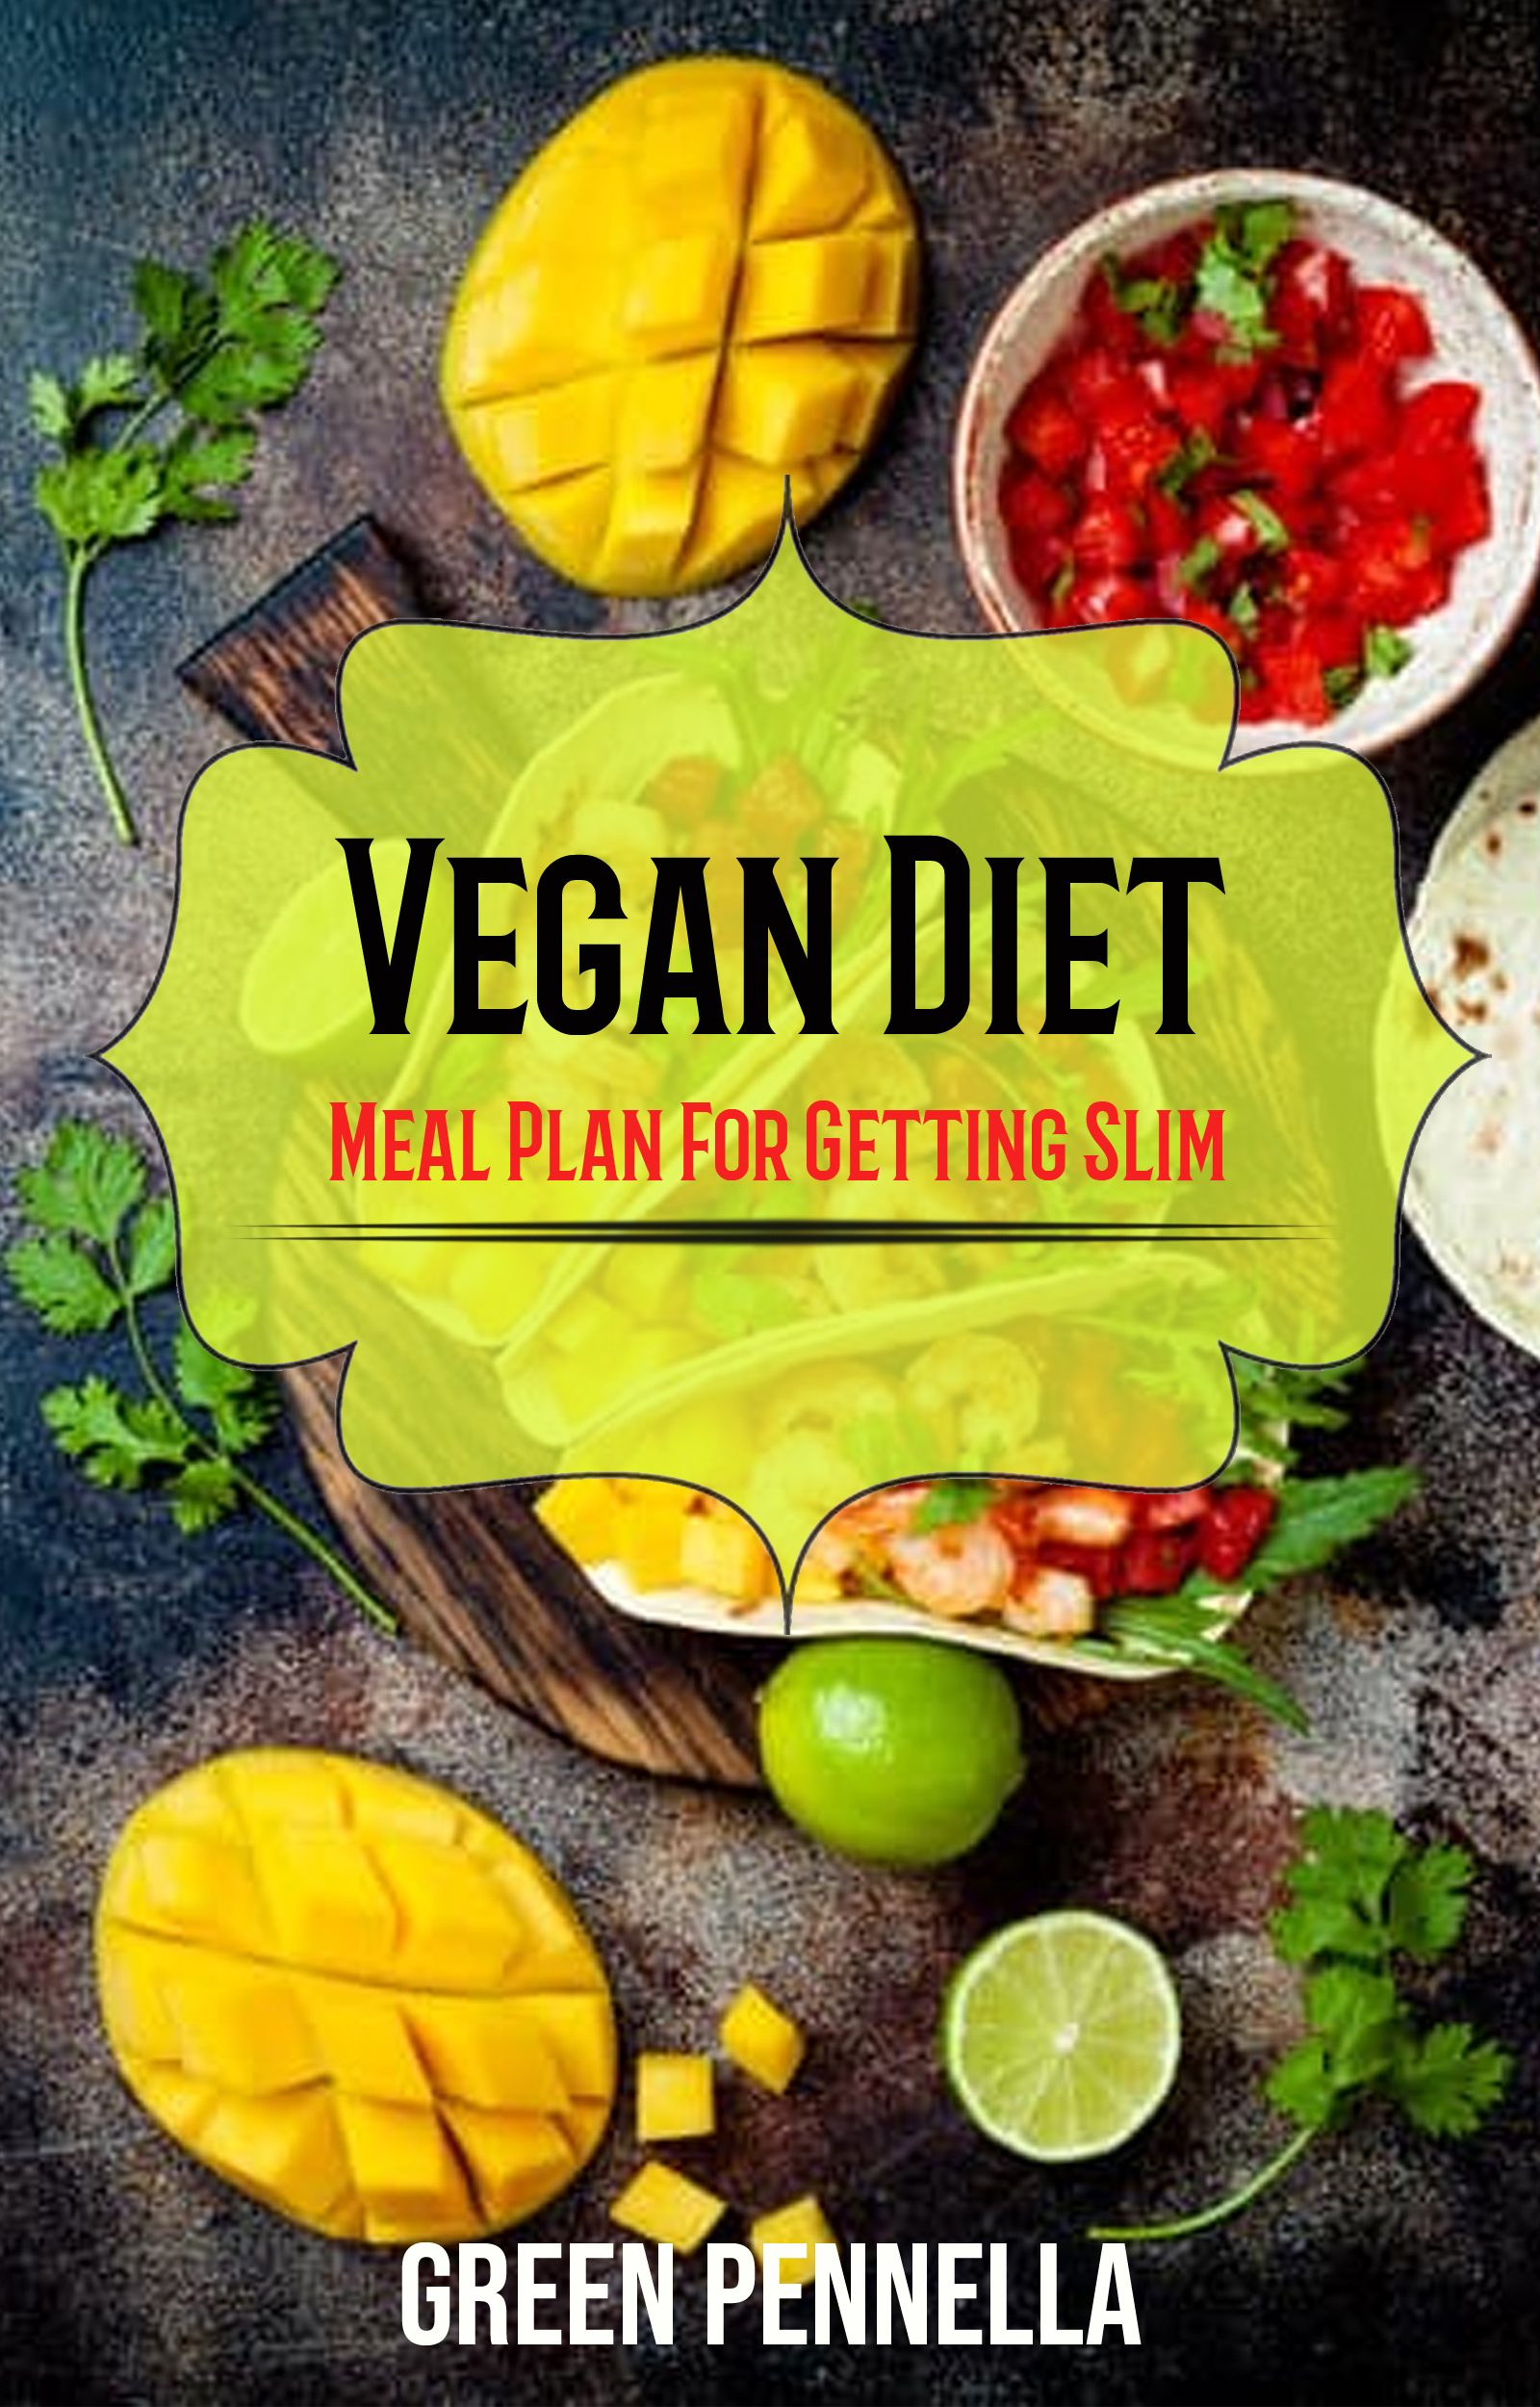 Vegan diet: meal plan for getting slim